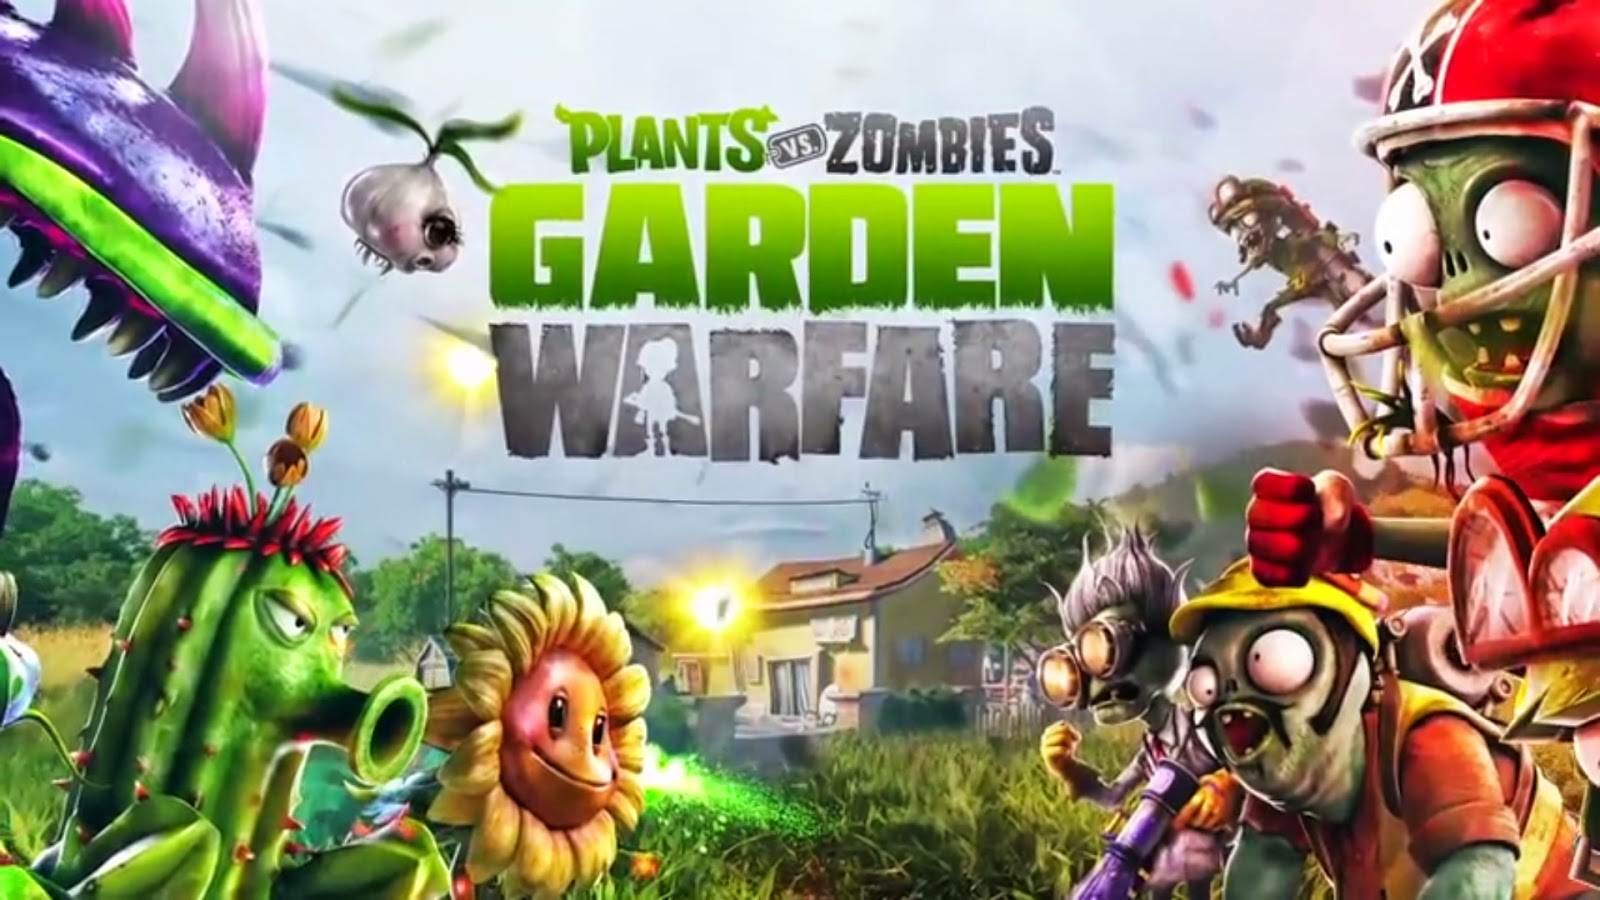 plants vs zombies garden warfare pc download cracked